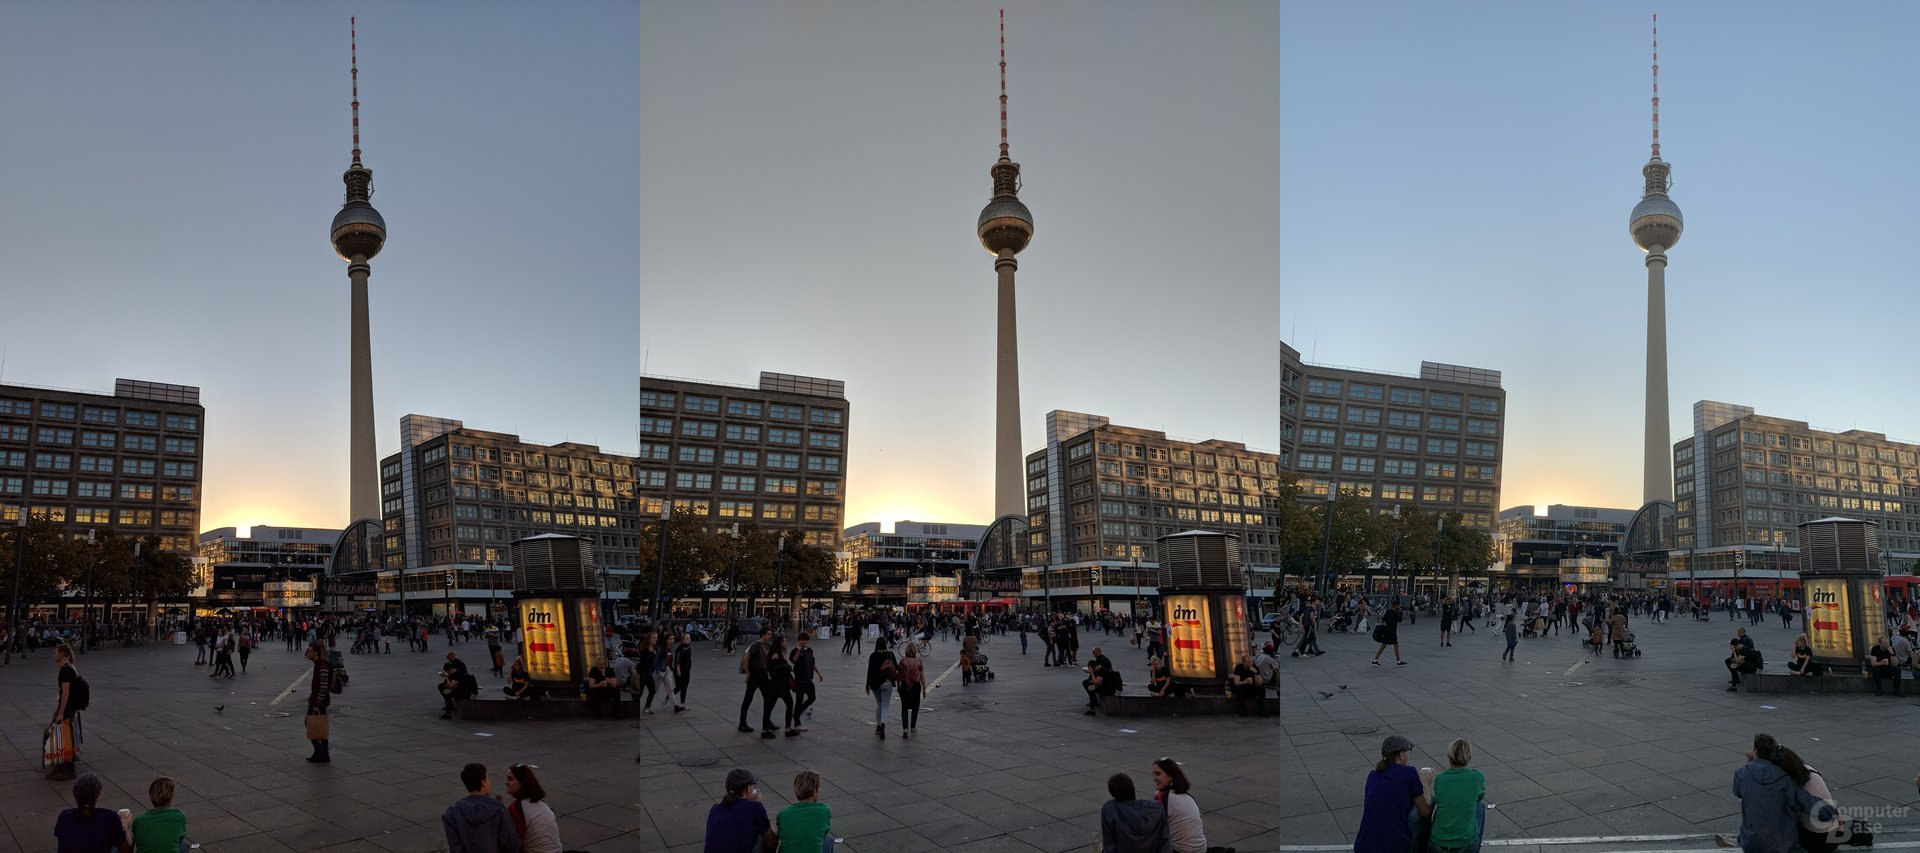 Pixel 3 XL, Pixel 2, iPhone Xs Max (v.l.n.r.)